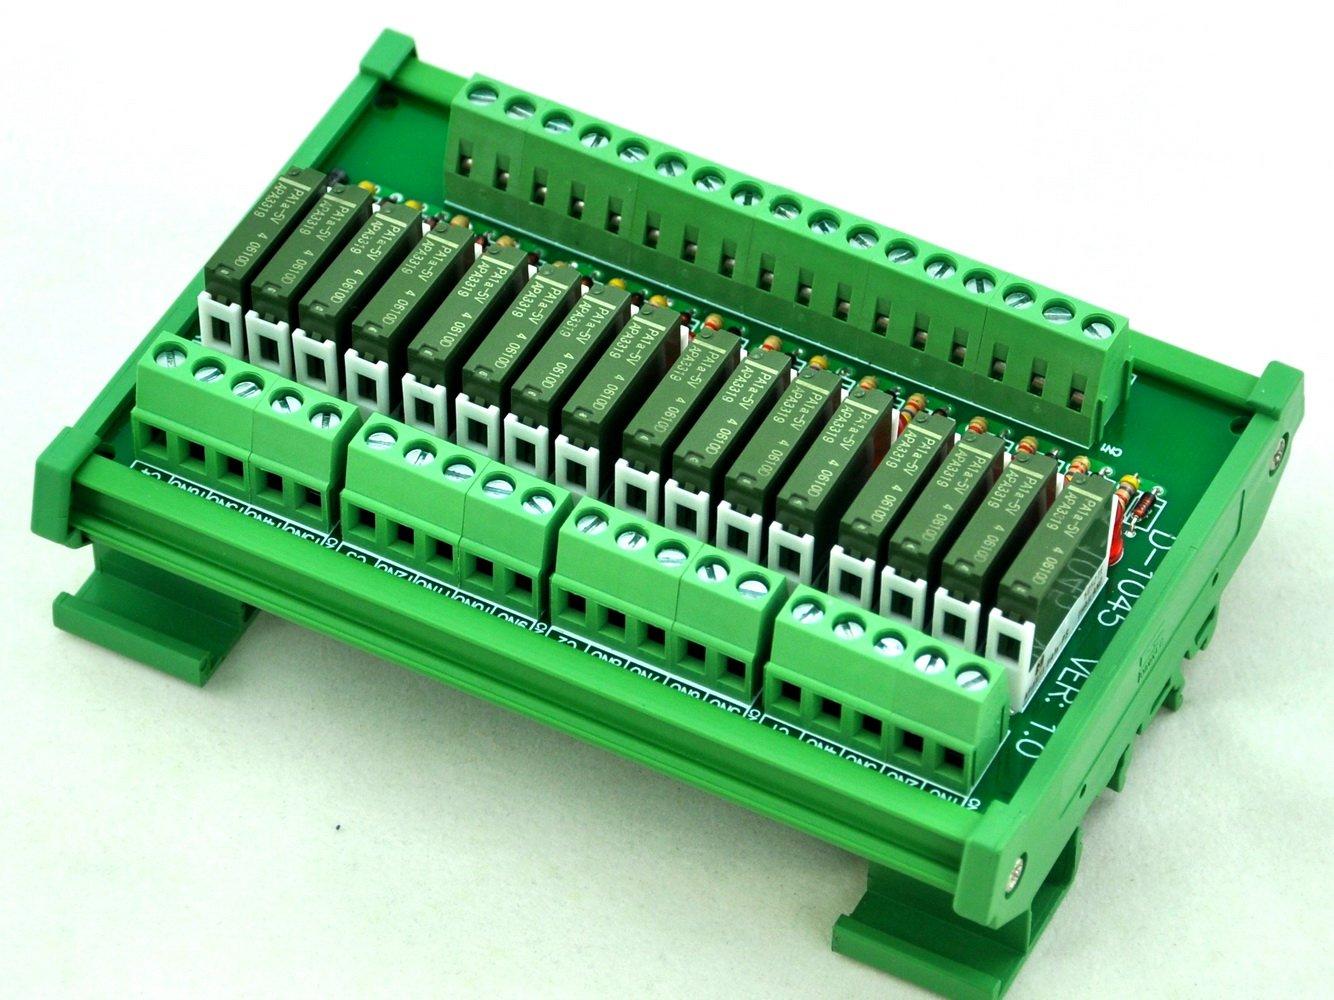 PA1a-5V ELECTRONICS-SALON Slim DIN Rail Mount DC5V Source//PNP 16 SPST-NO 5A Power Relay Module